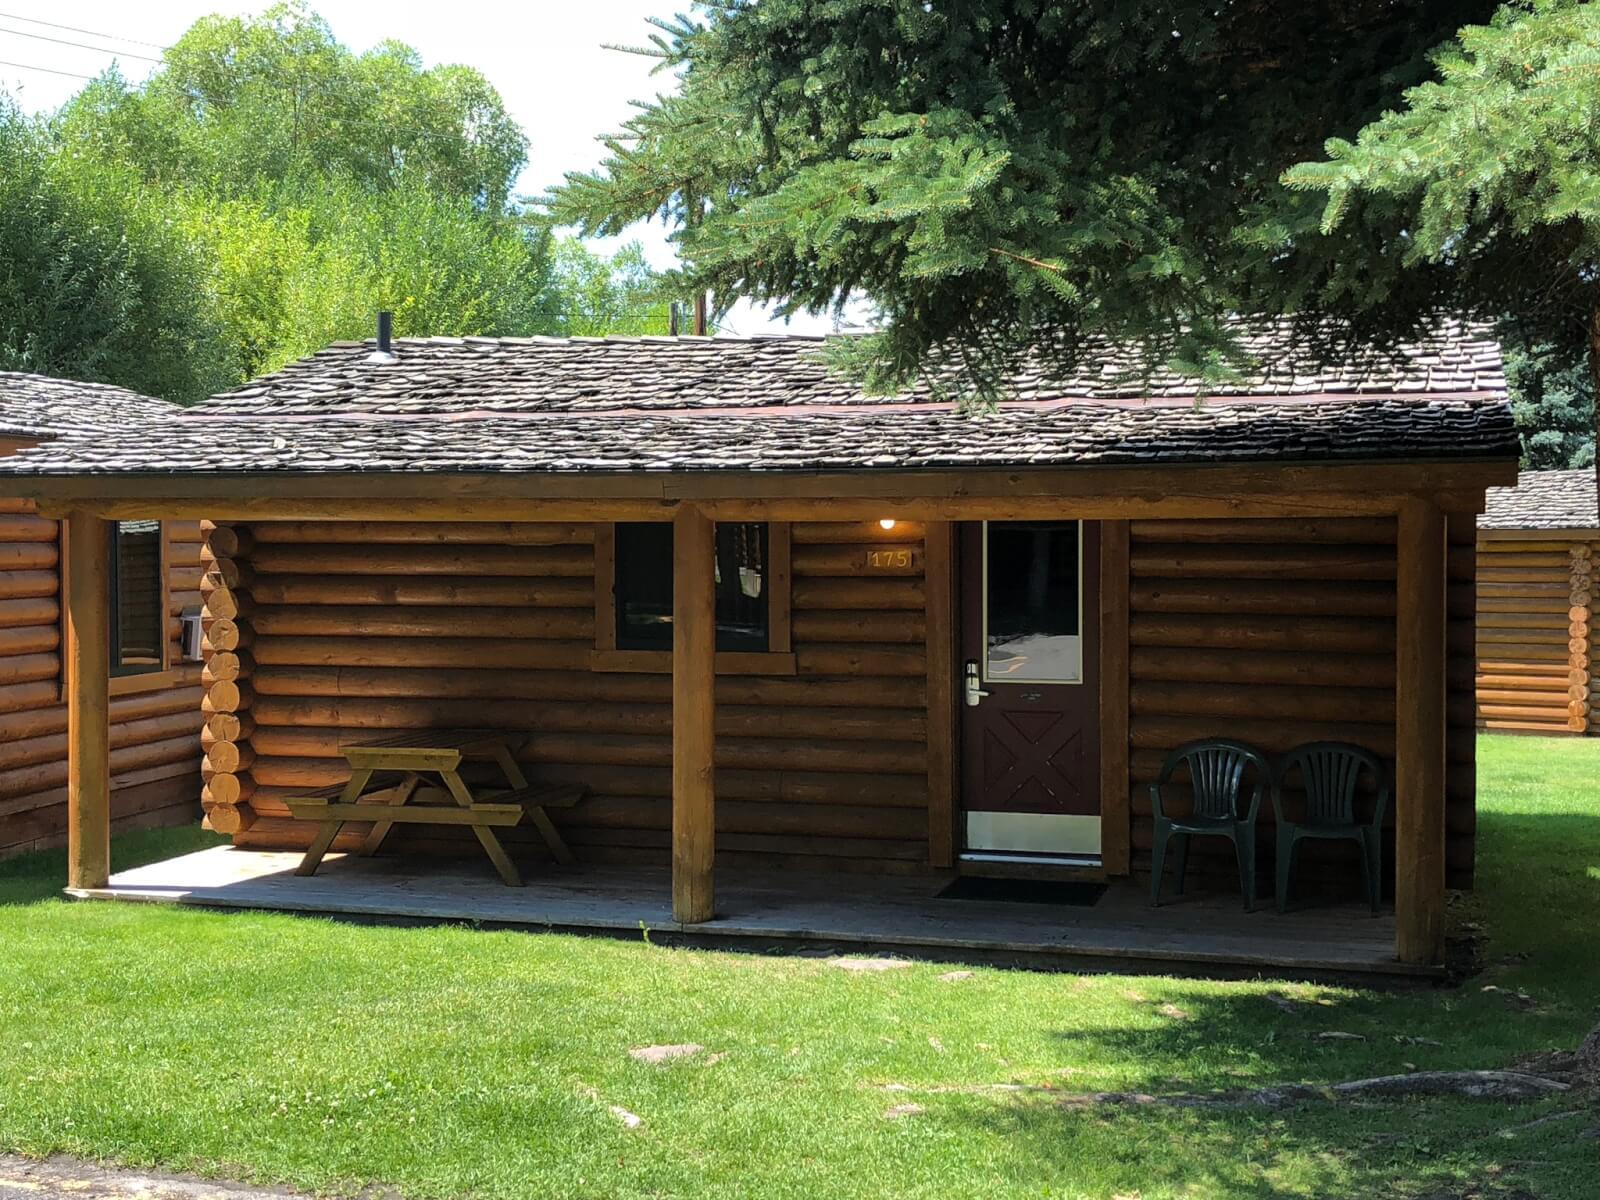 Cowboy Village cabins in Jackson Hole Wyoming